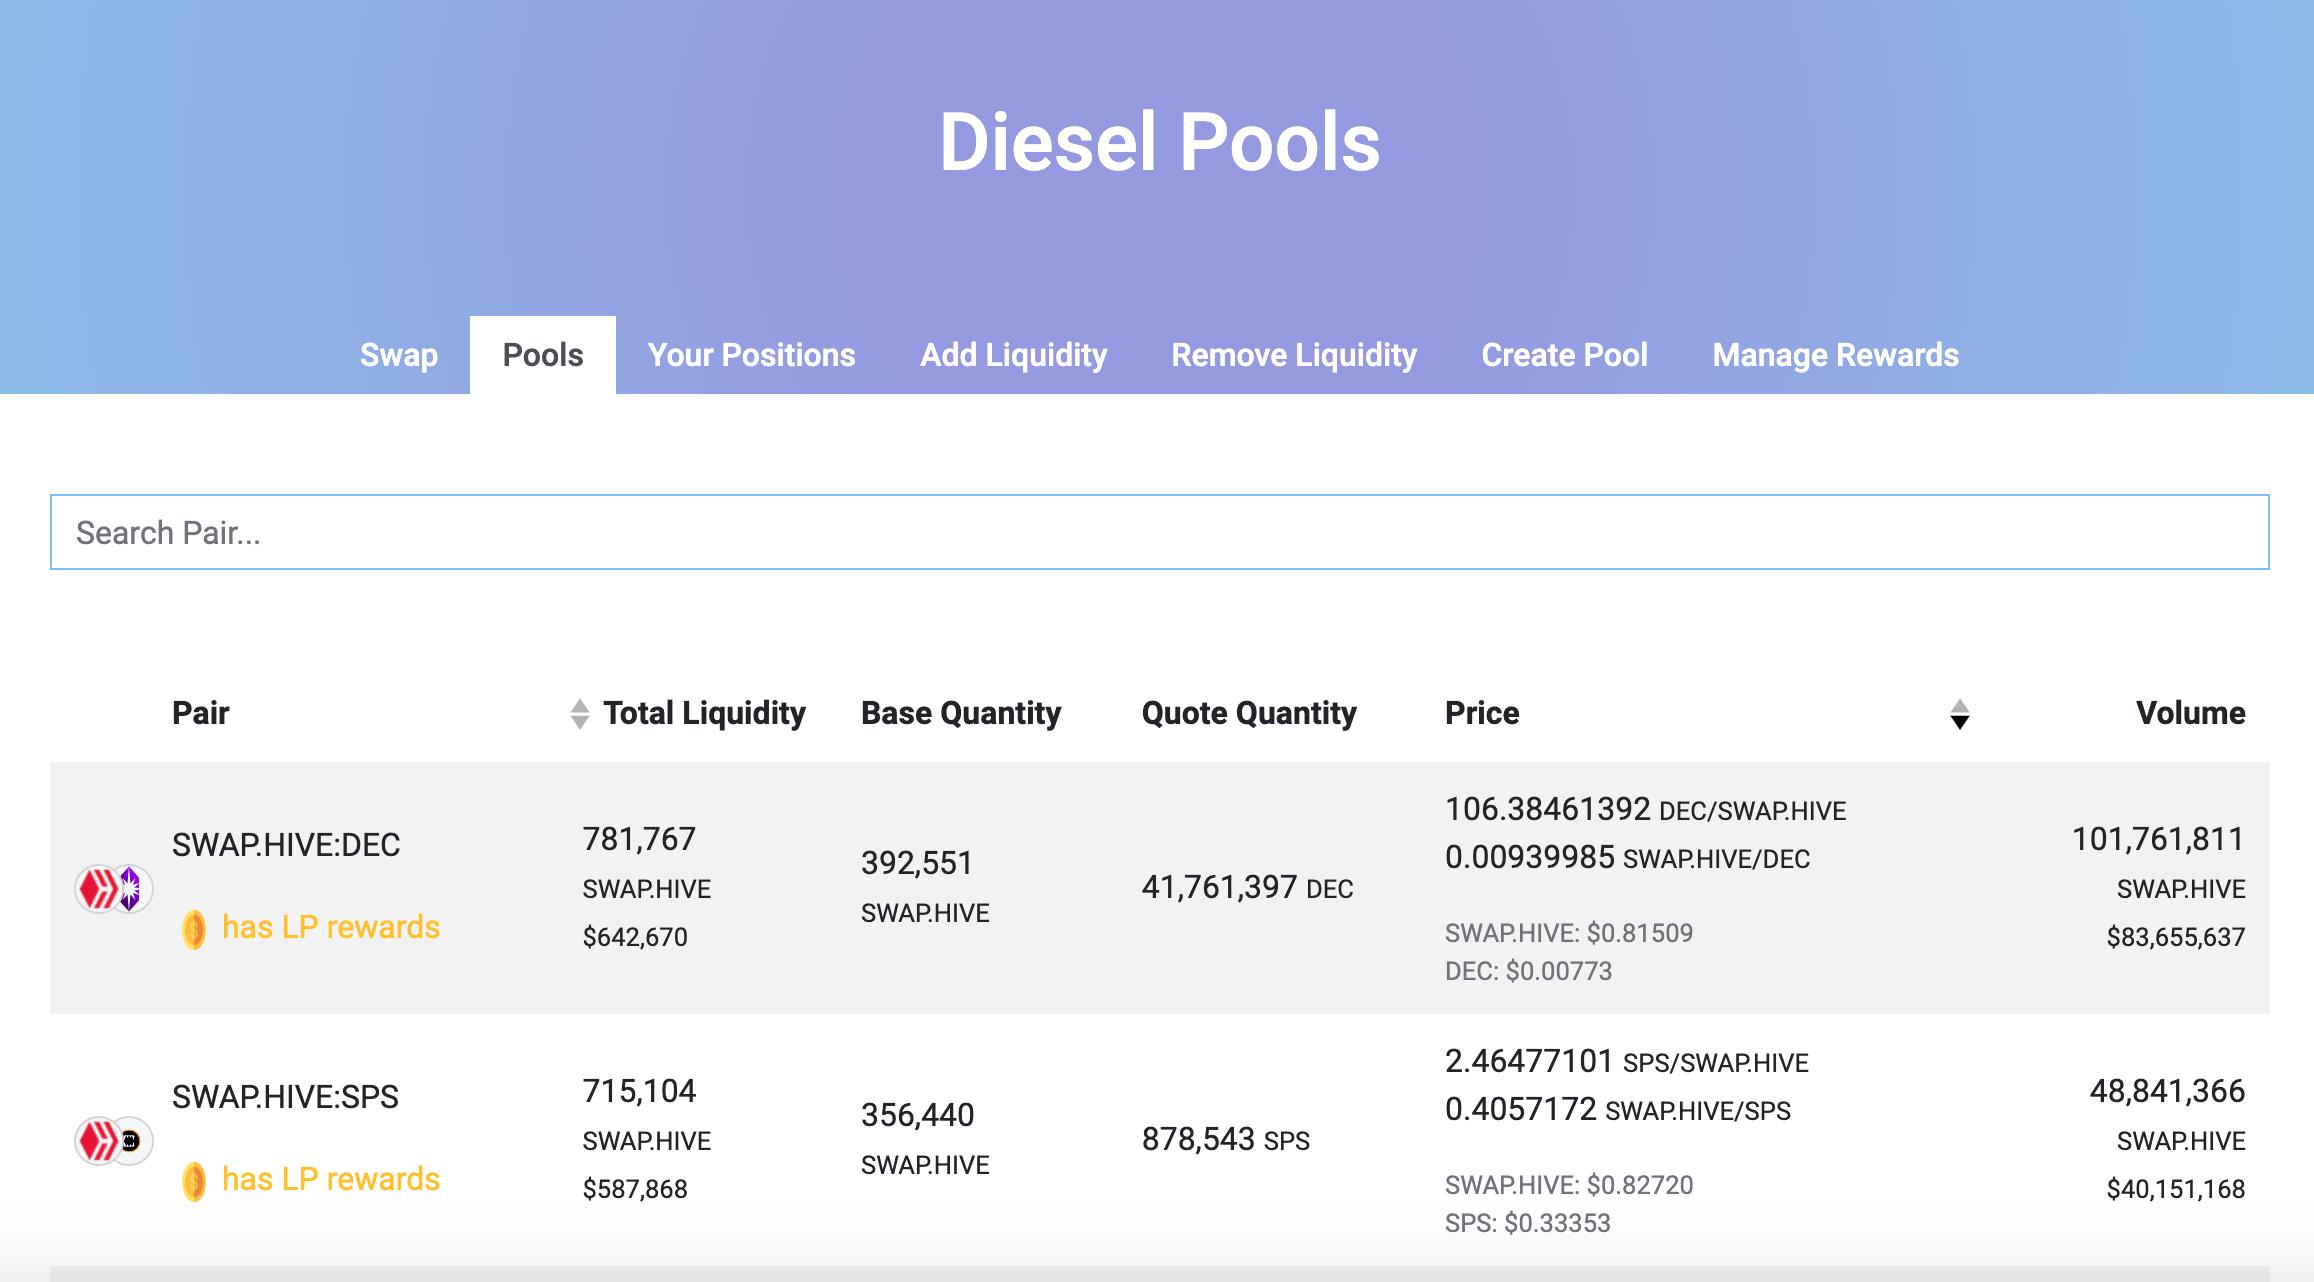 Tribaldex screenshot showing the DeFi liquidity pools on Hive called Diesel Pools.